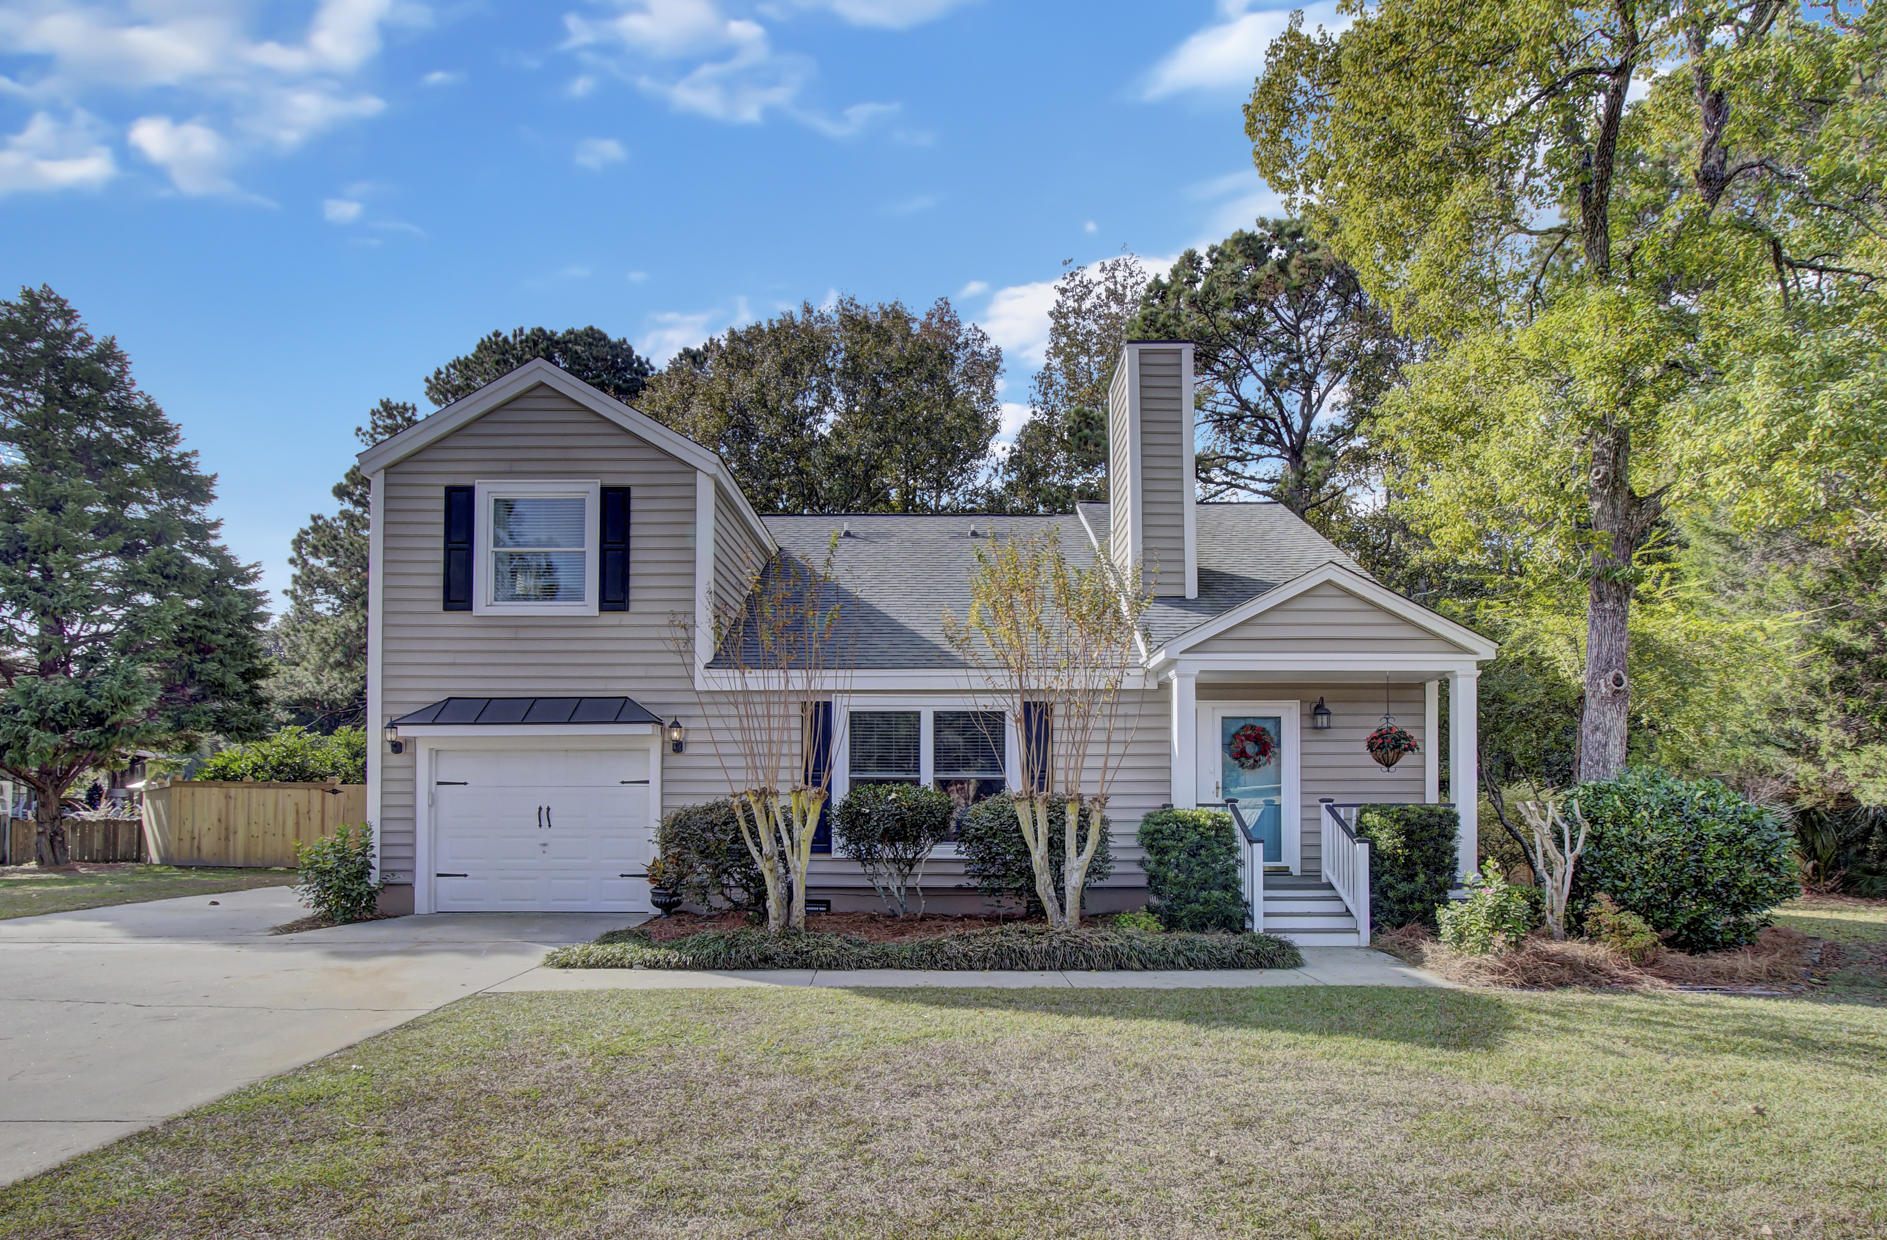 Snee Farm Homes For Sale - 978 Law, Mount Pleasant, SC - 0